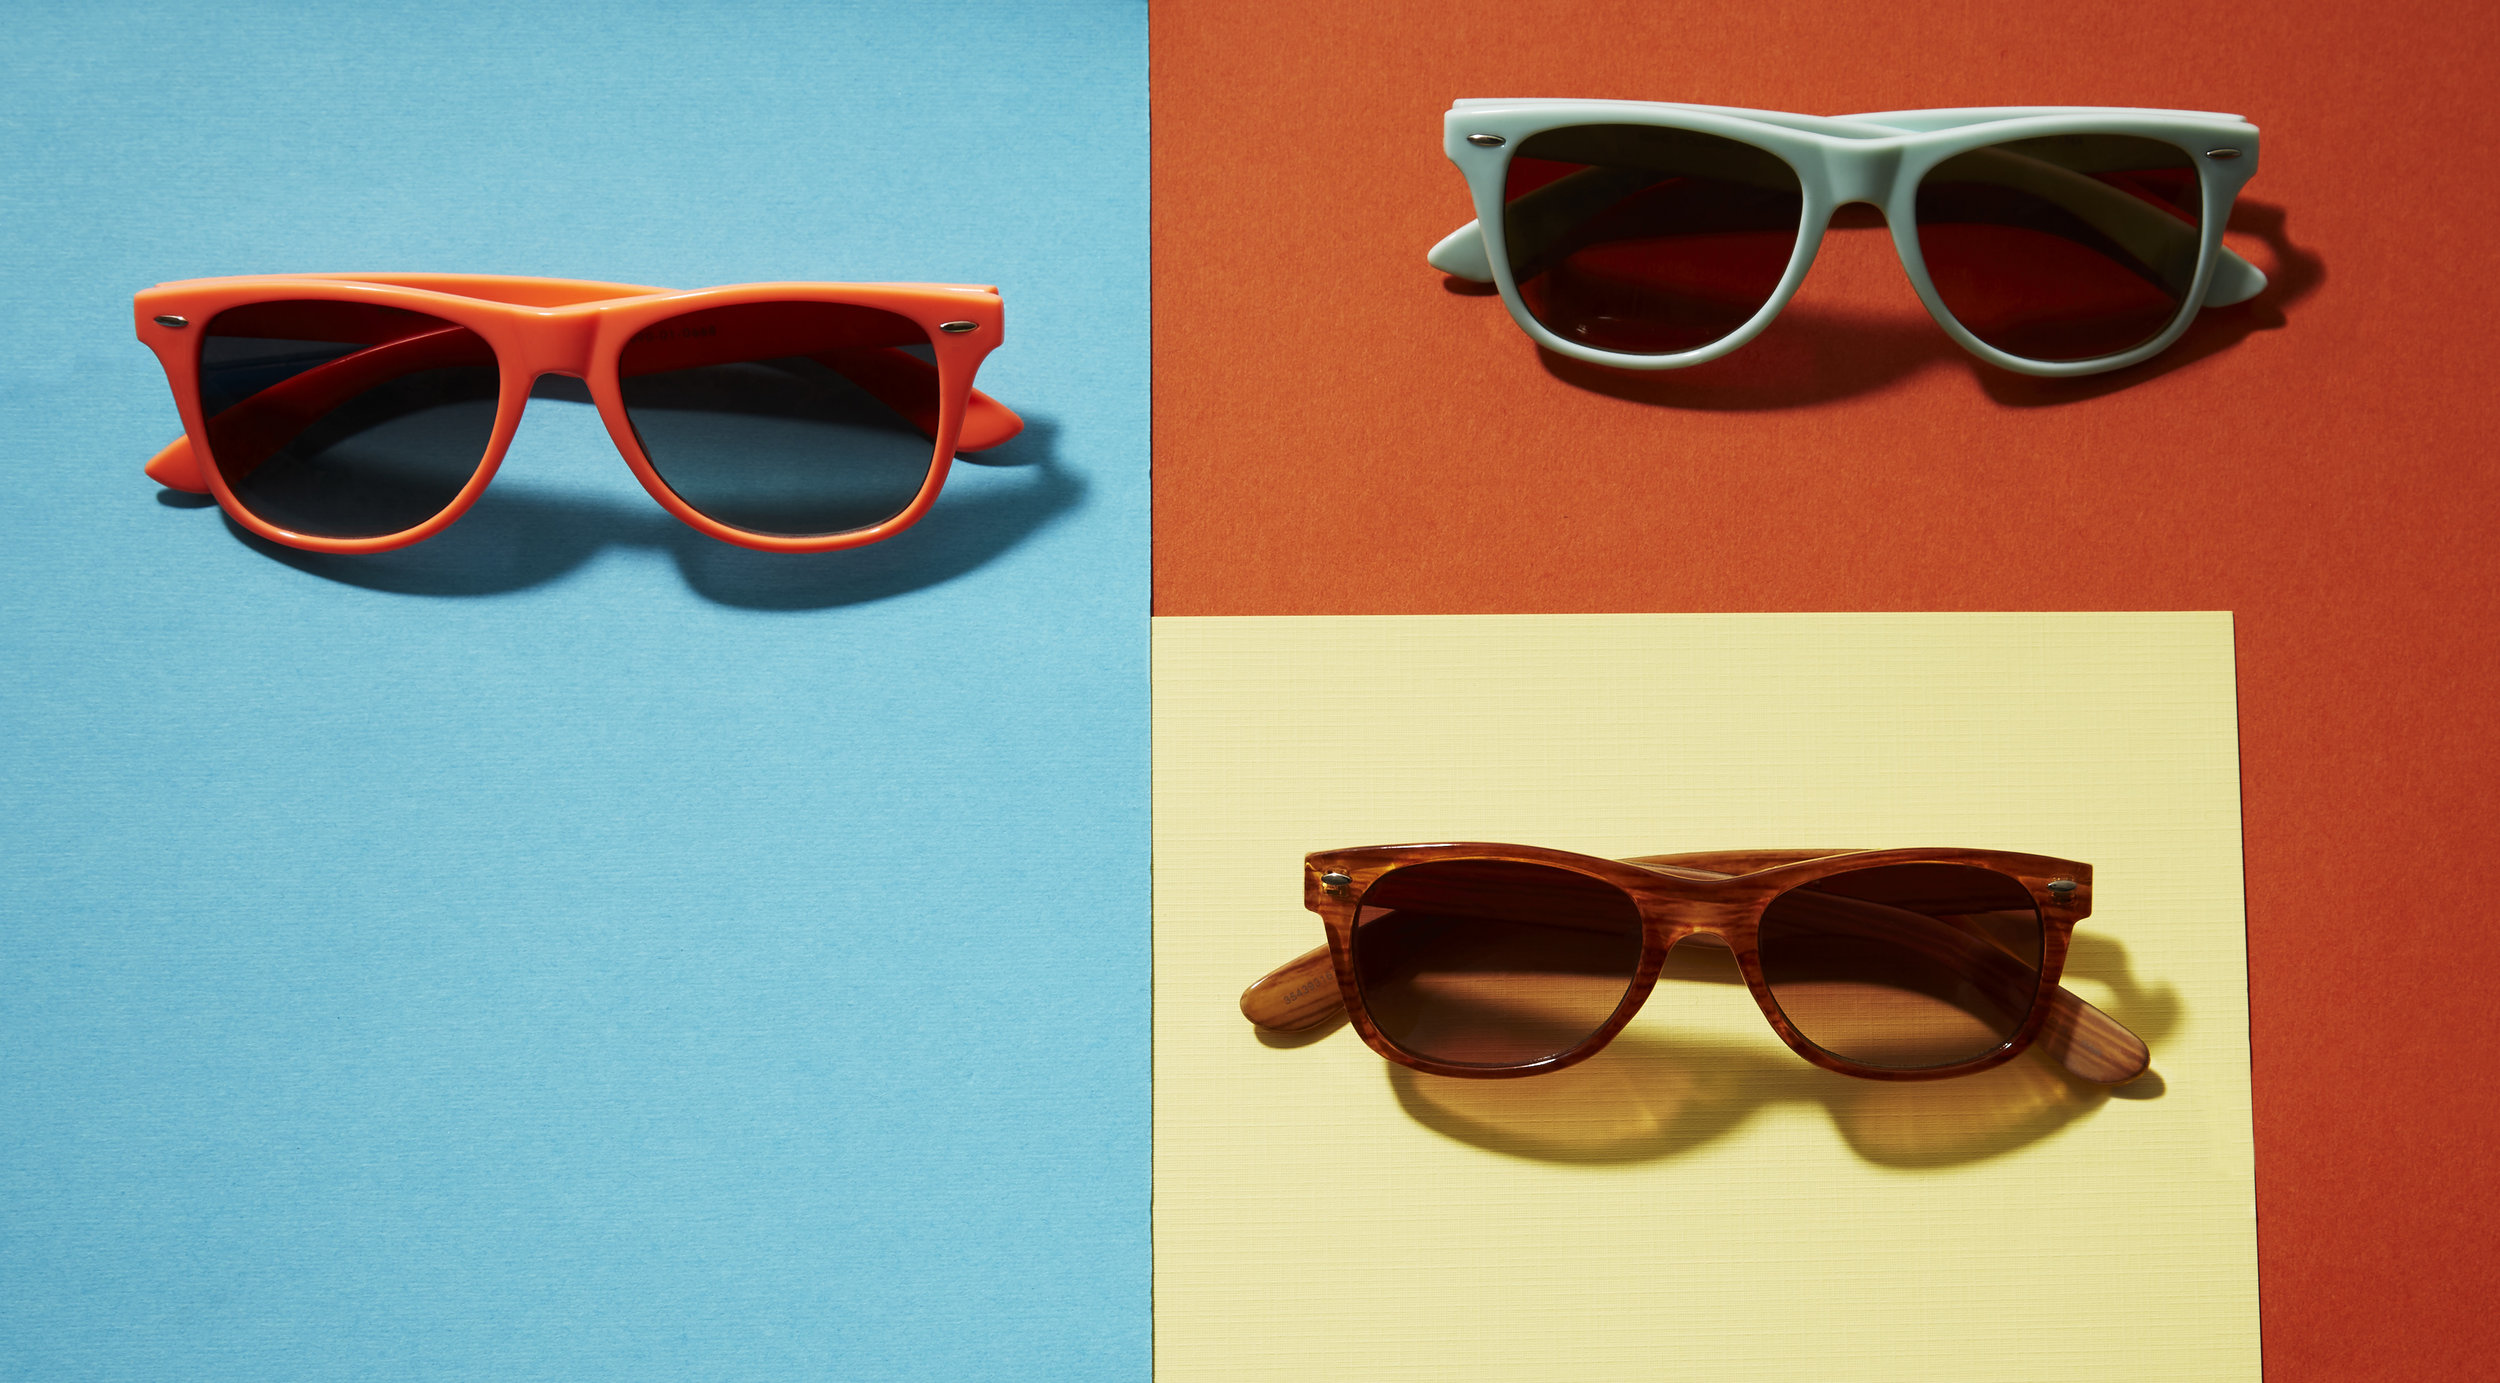 Sunglasses-061.jpg